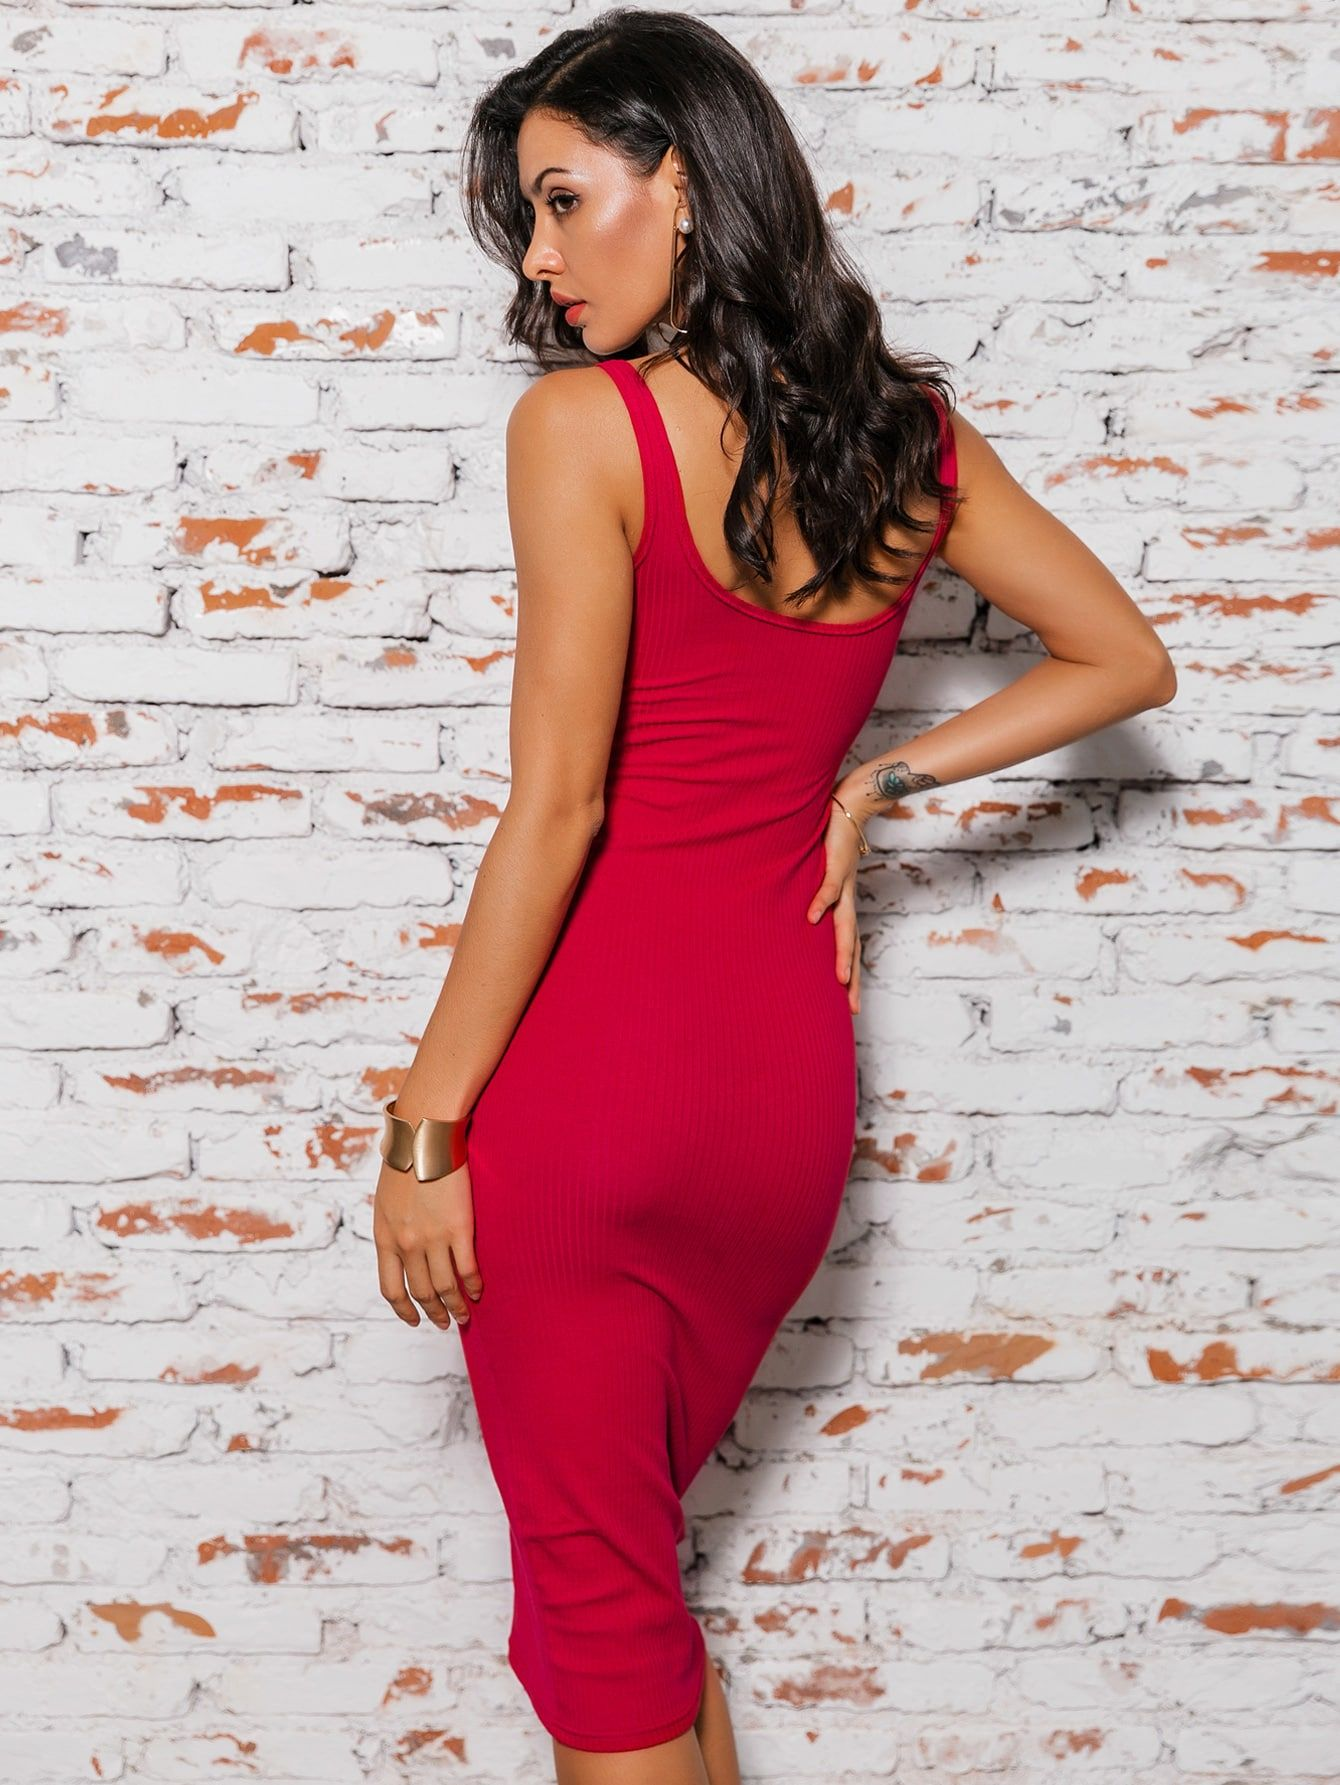 Glamaker Solid Rib Knit Bodycon Dress Bodycon Dress Ribbed Knit Bodycon Dress Mesh Sleeved Dress [ 1785 x 1340 Pixel ]